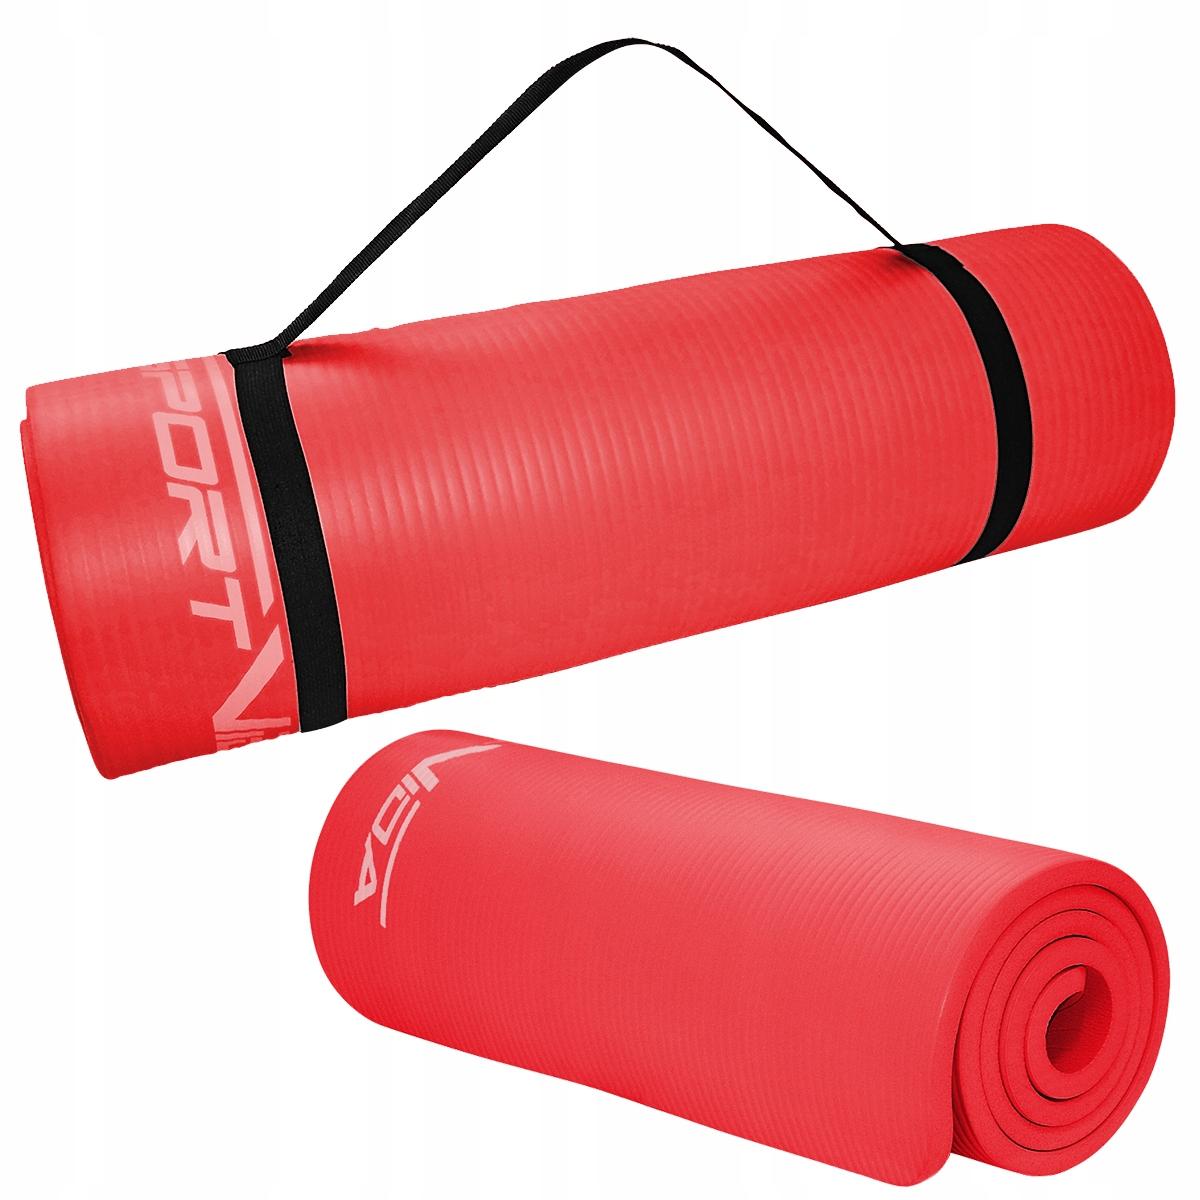 Mata NBR 1,5 cm czerwona